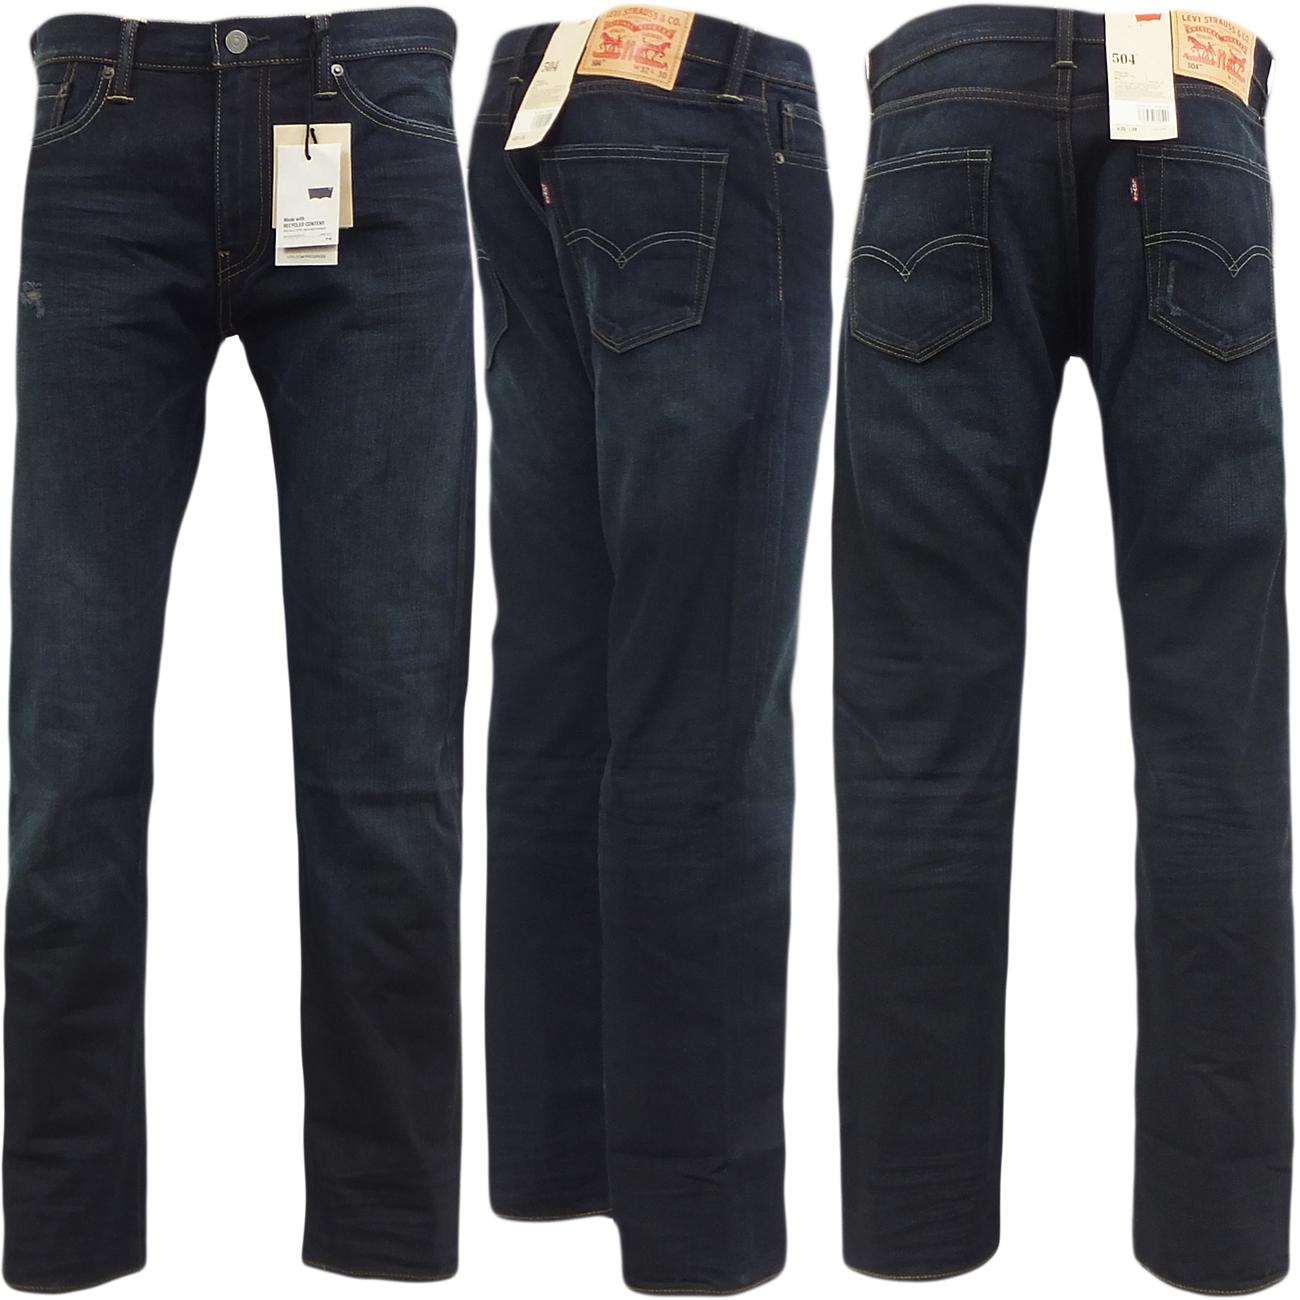 mens levi jeans 504 straight leg standard fit denim jean. Black Bedroom Furniture Sets. Home Design Ideas